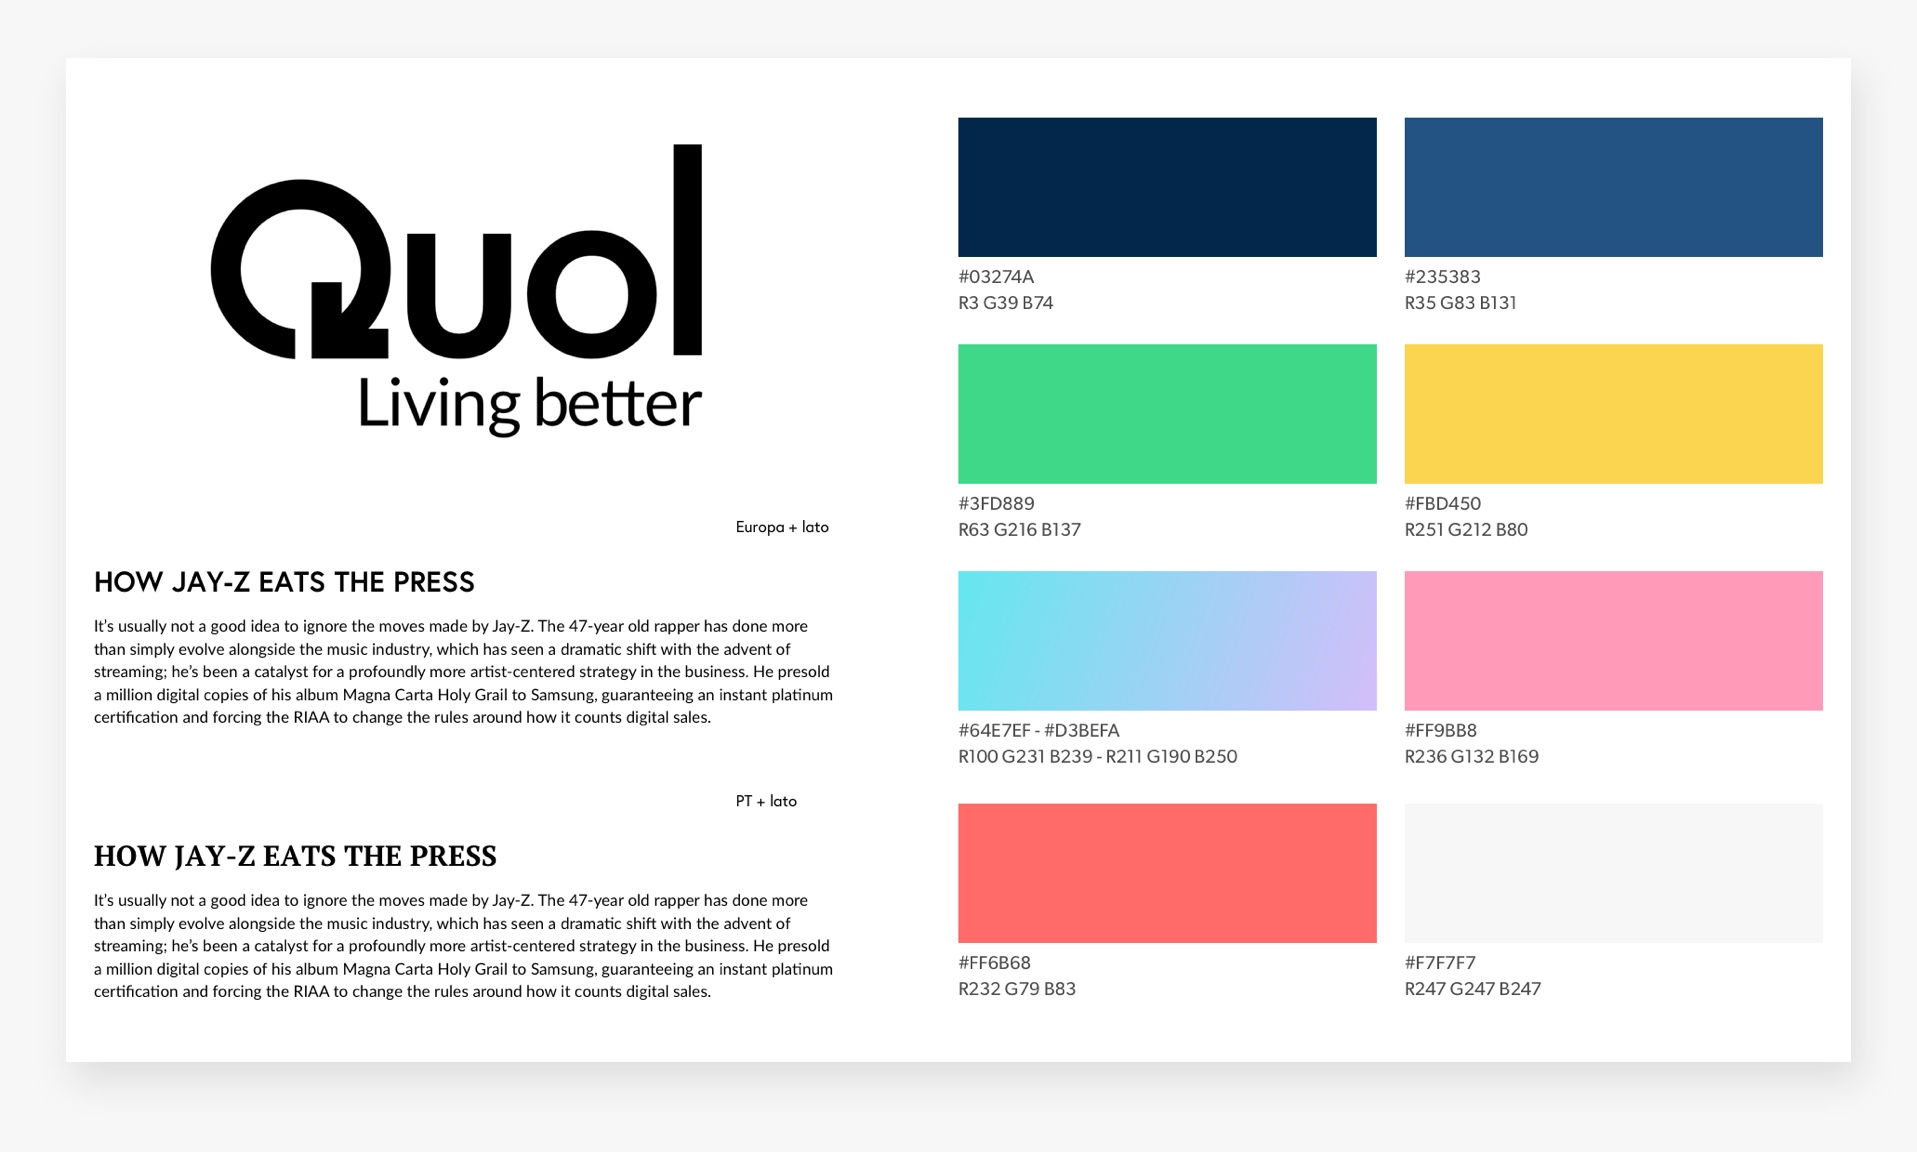 Quol-wellness-platform-design-furthermore.jpg